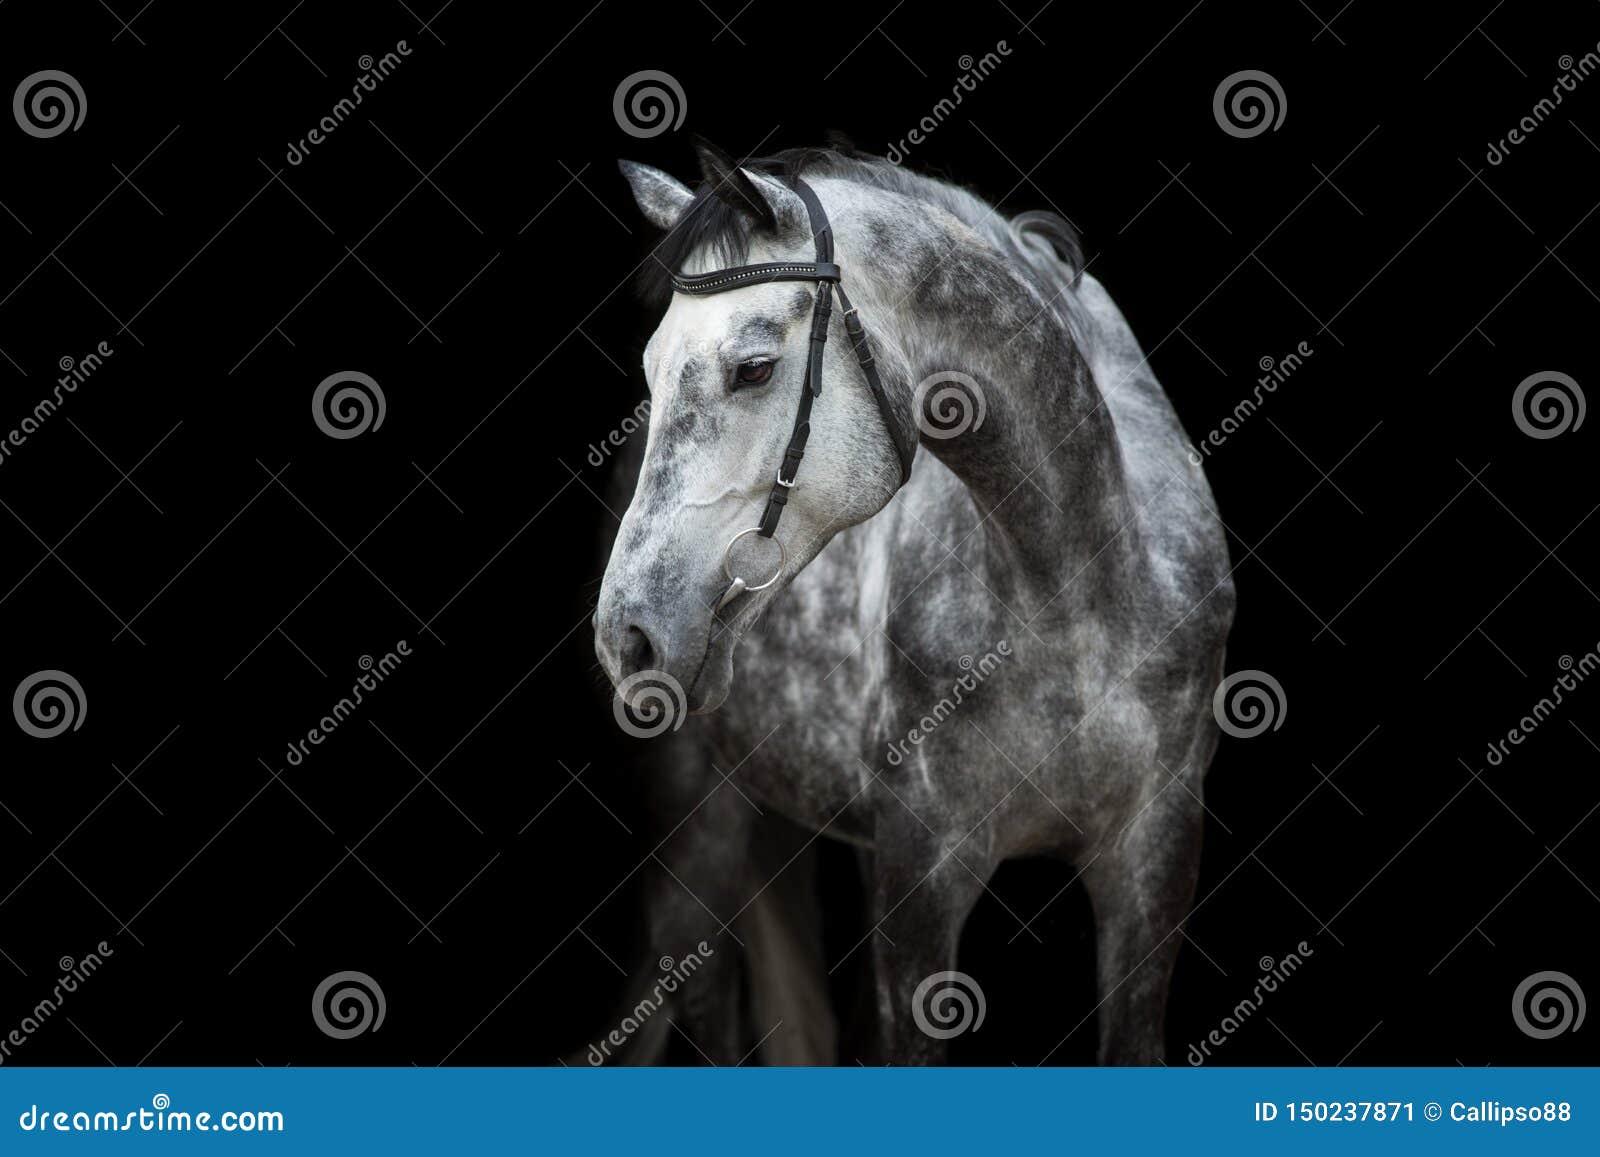 Horse portrait on black